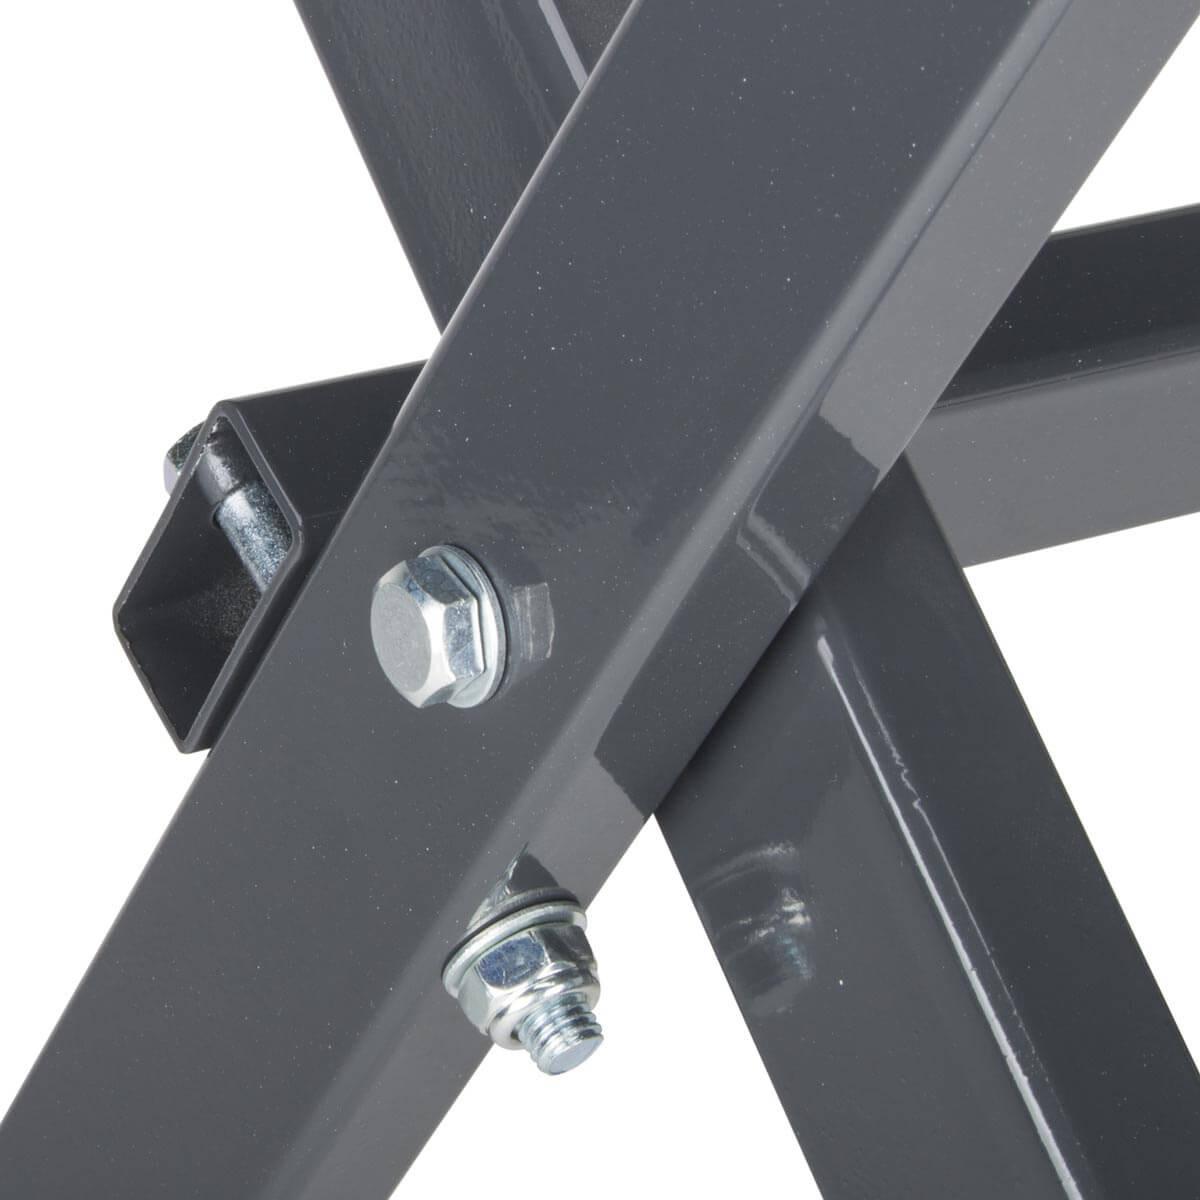 25966 Folding Stand Rubi DU-200 saw